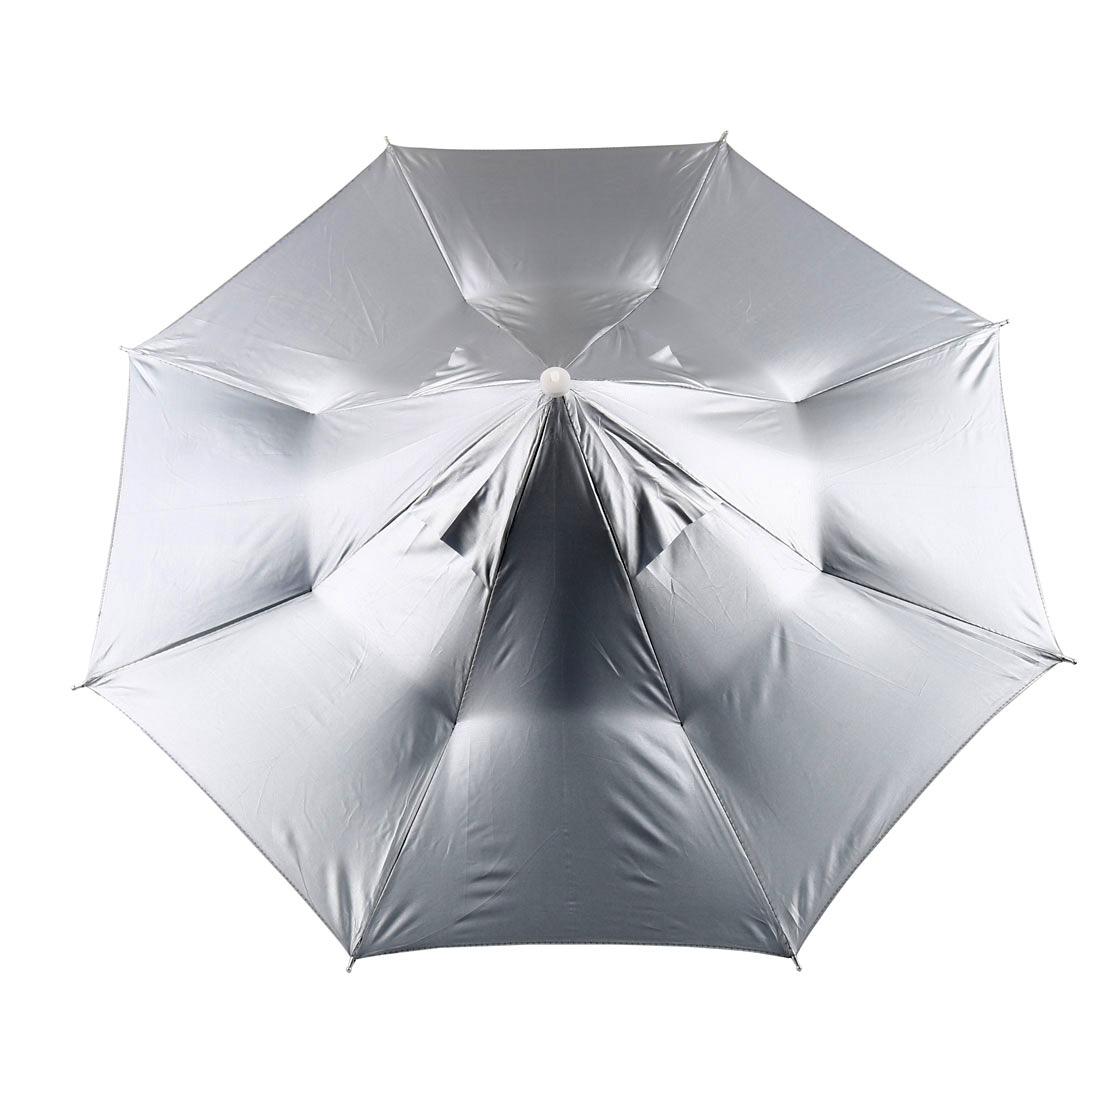 Fishing Folding Hands Free Sun Umbrella Hat UV Parasols Headband Silver White